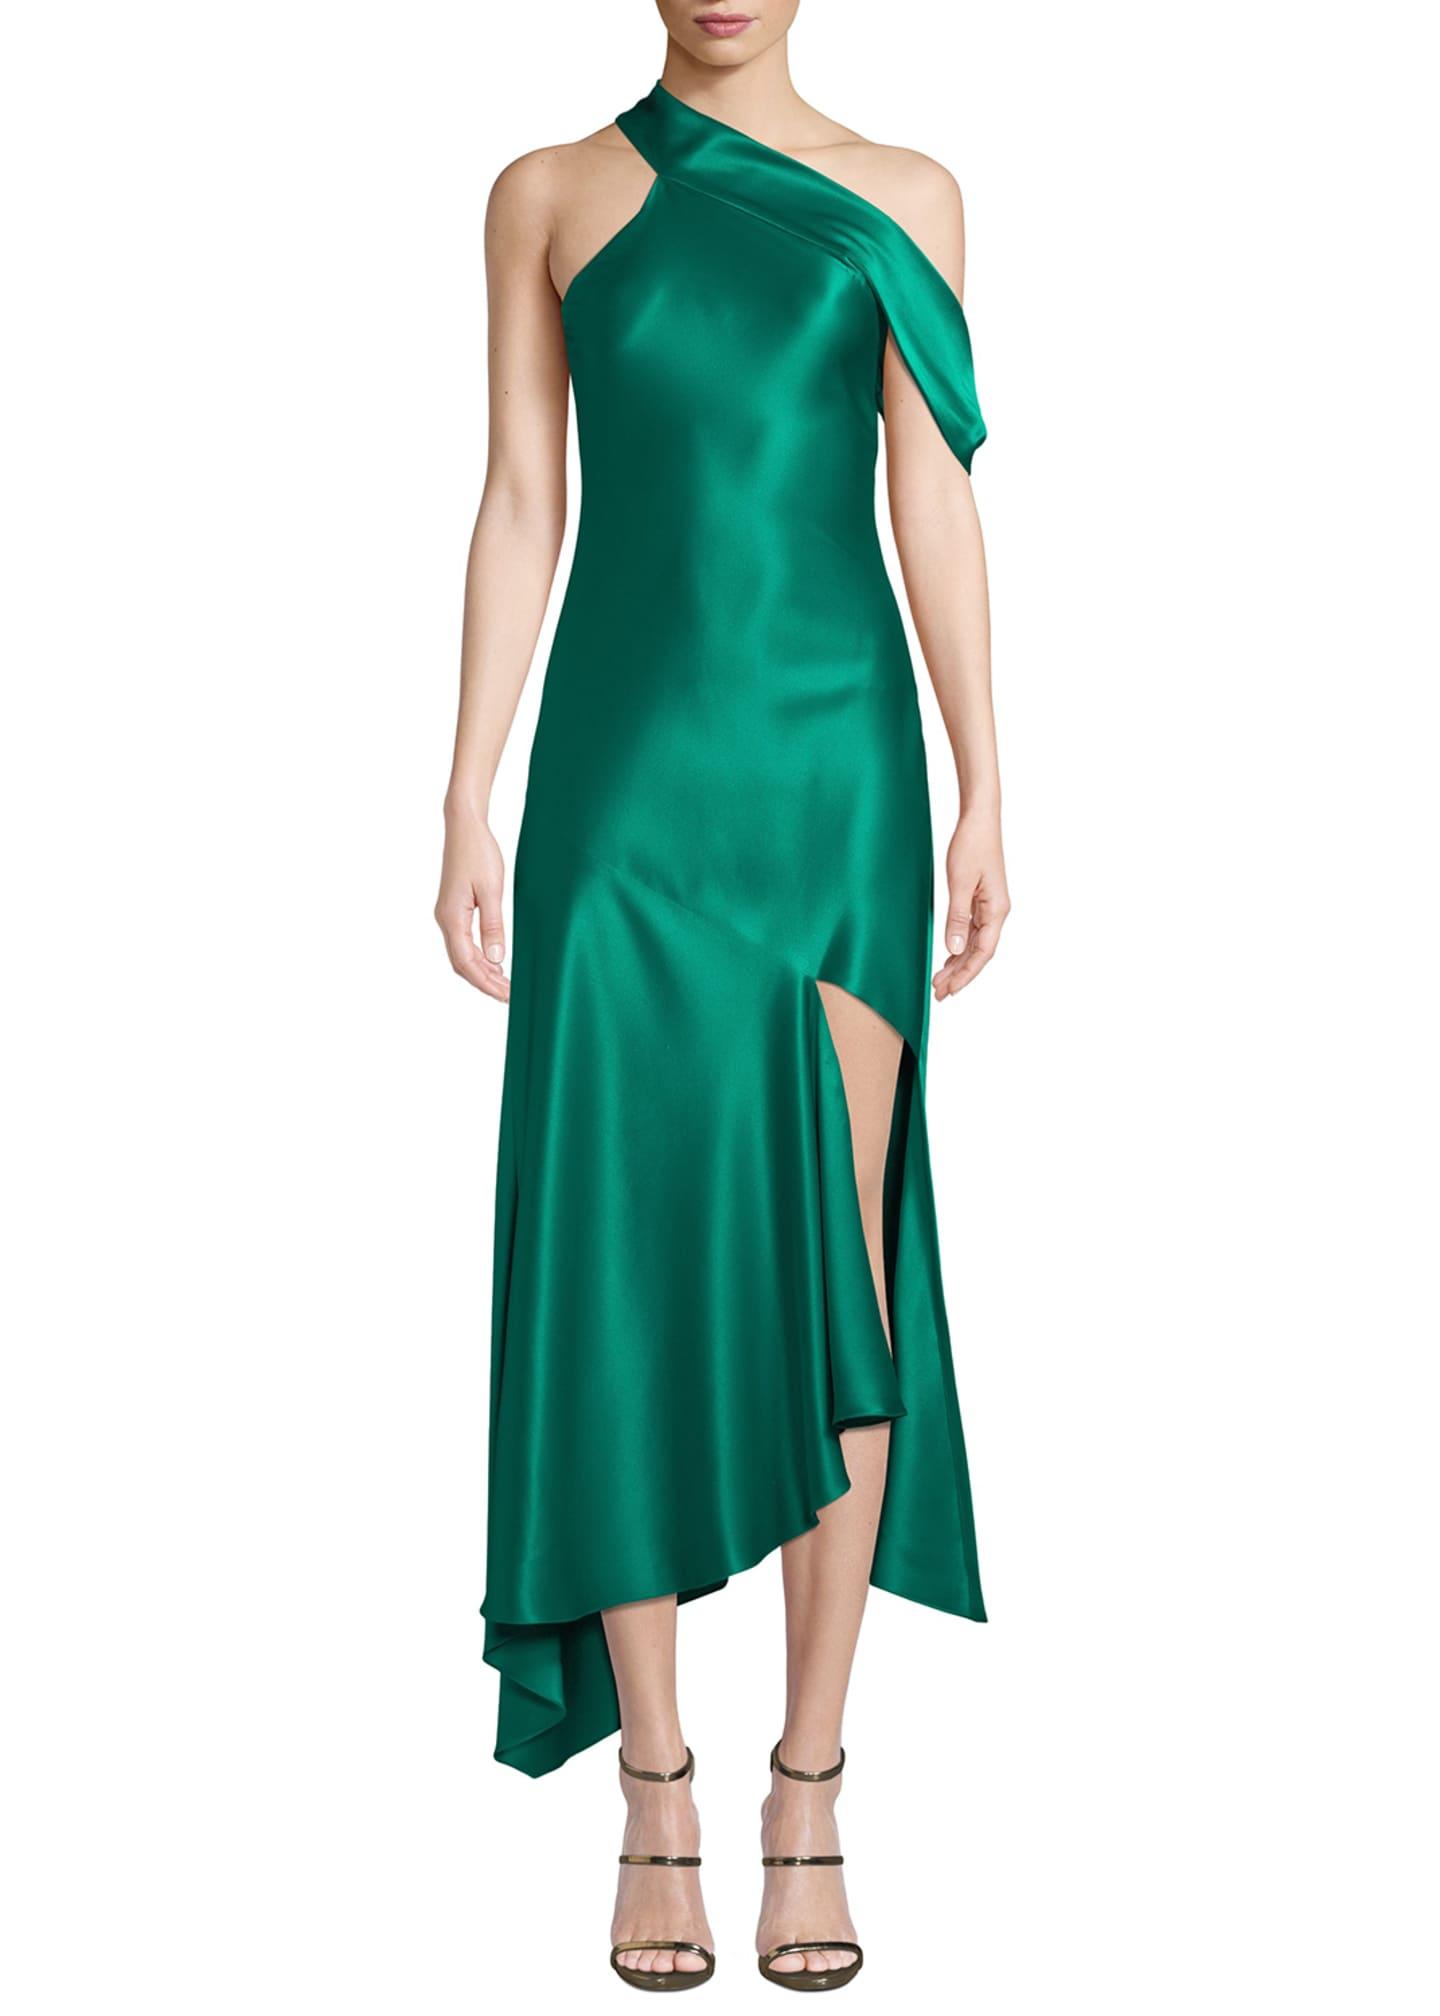 CUSHNIE One-Shoulder Satin Slip Dress